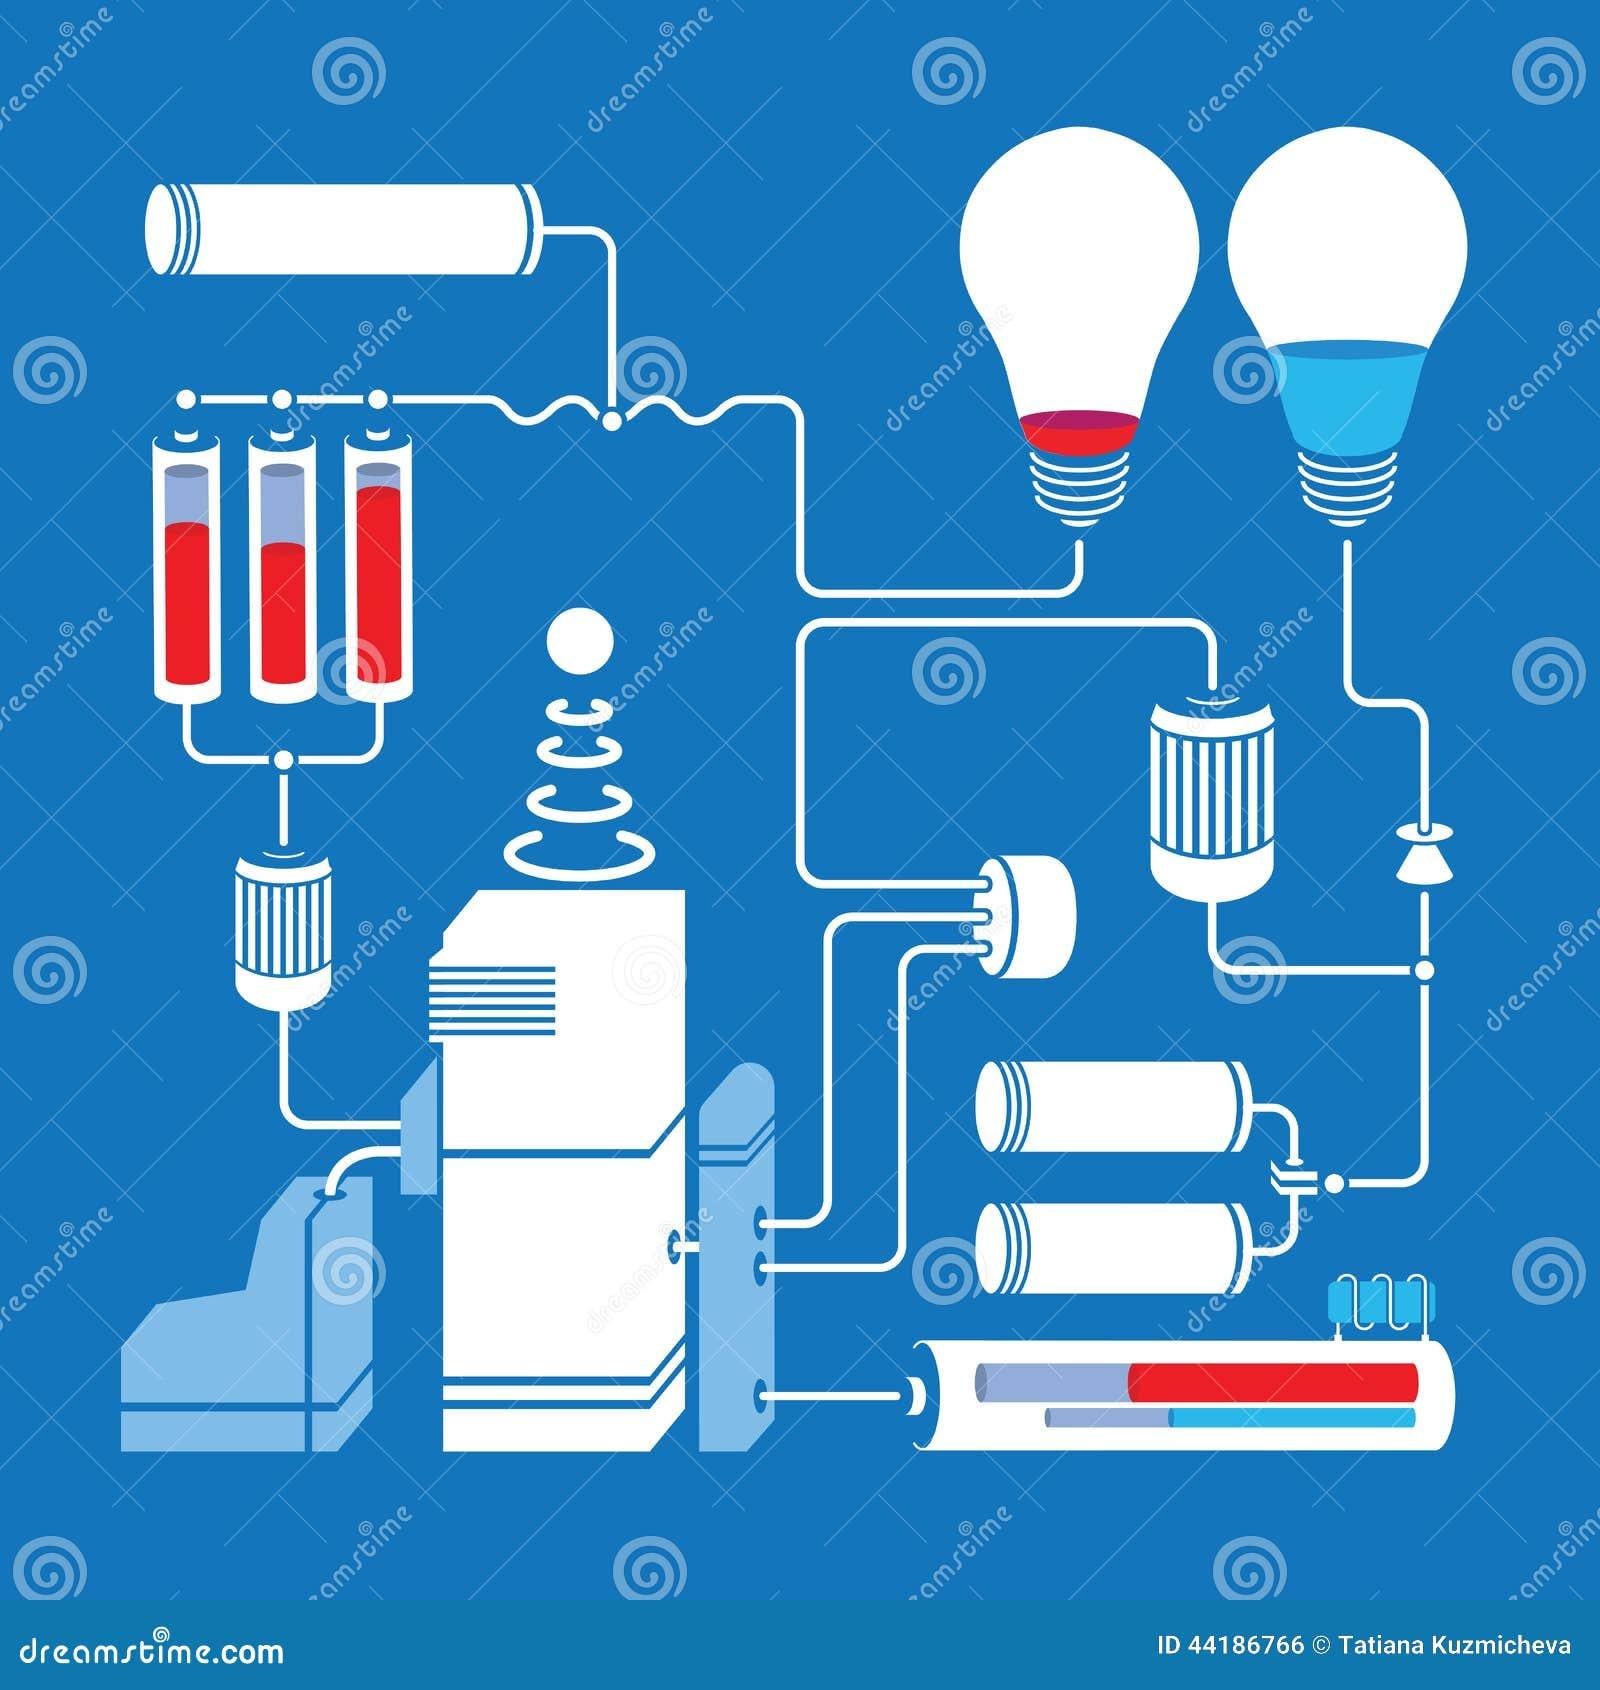 Electric Scheme With Light Bulbs Batteries And Stock Vector Lightbulbsymbolcircuitdiagram Bulb Symbol Circuit Diagram